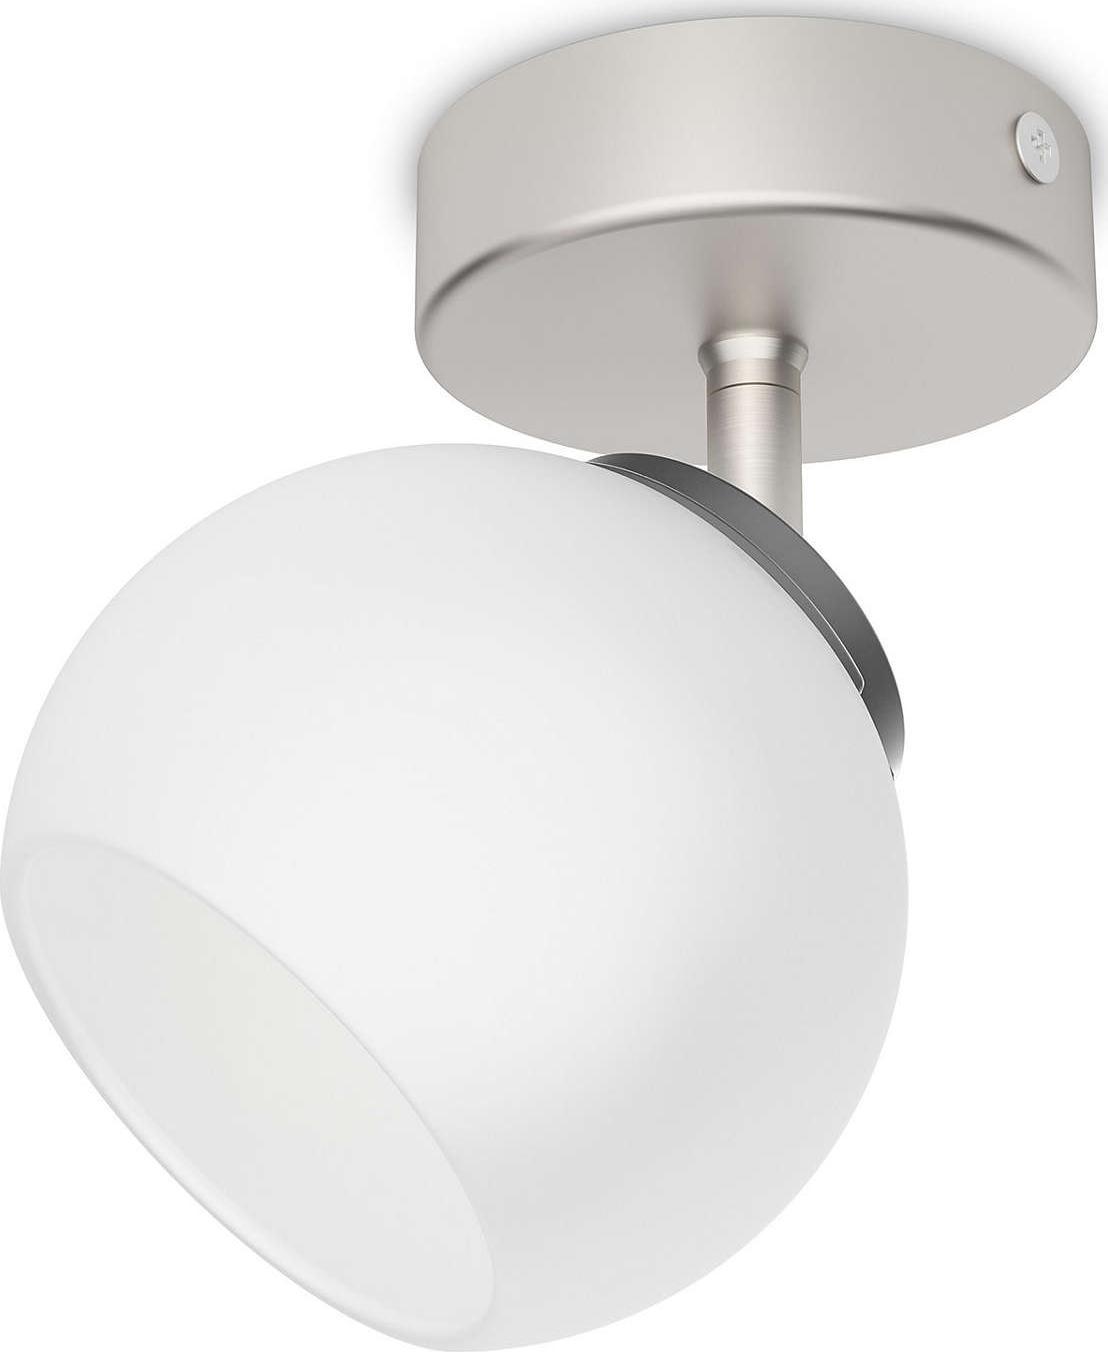 Philips LED balla svietidlo bodové chrom 4w 53320/17/16